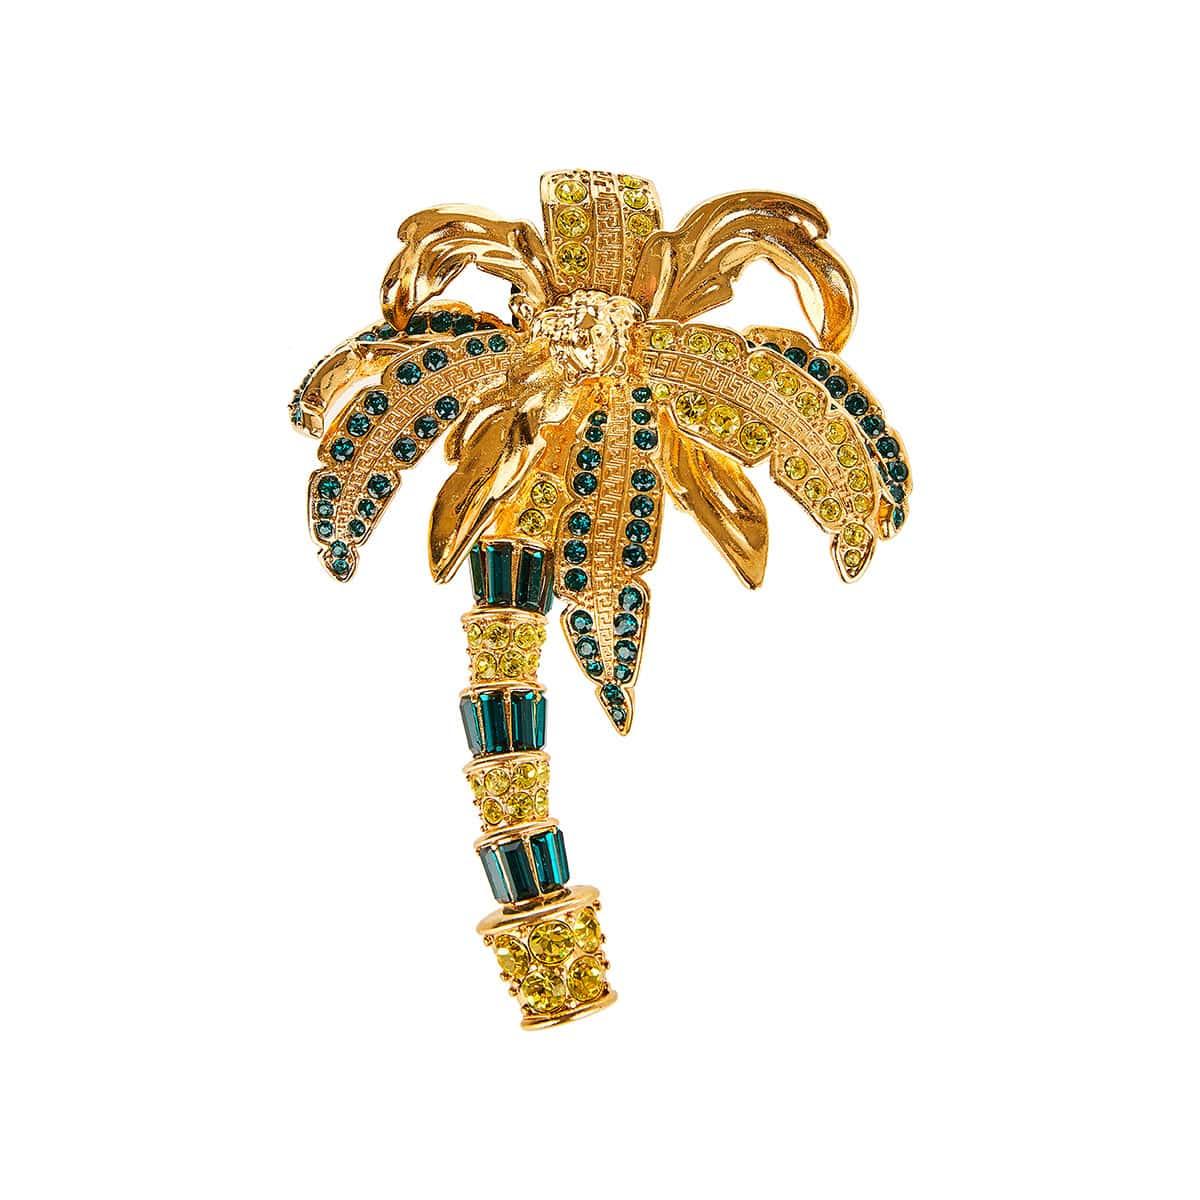 Crystal-embellished palm tree brooch